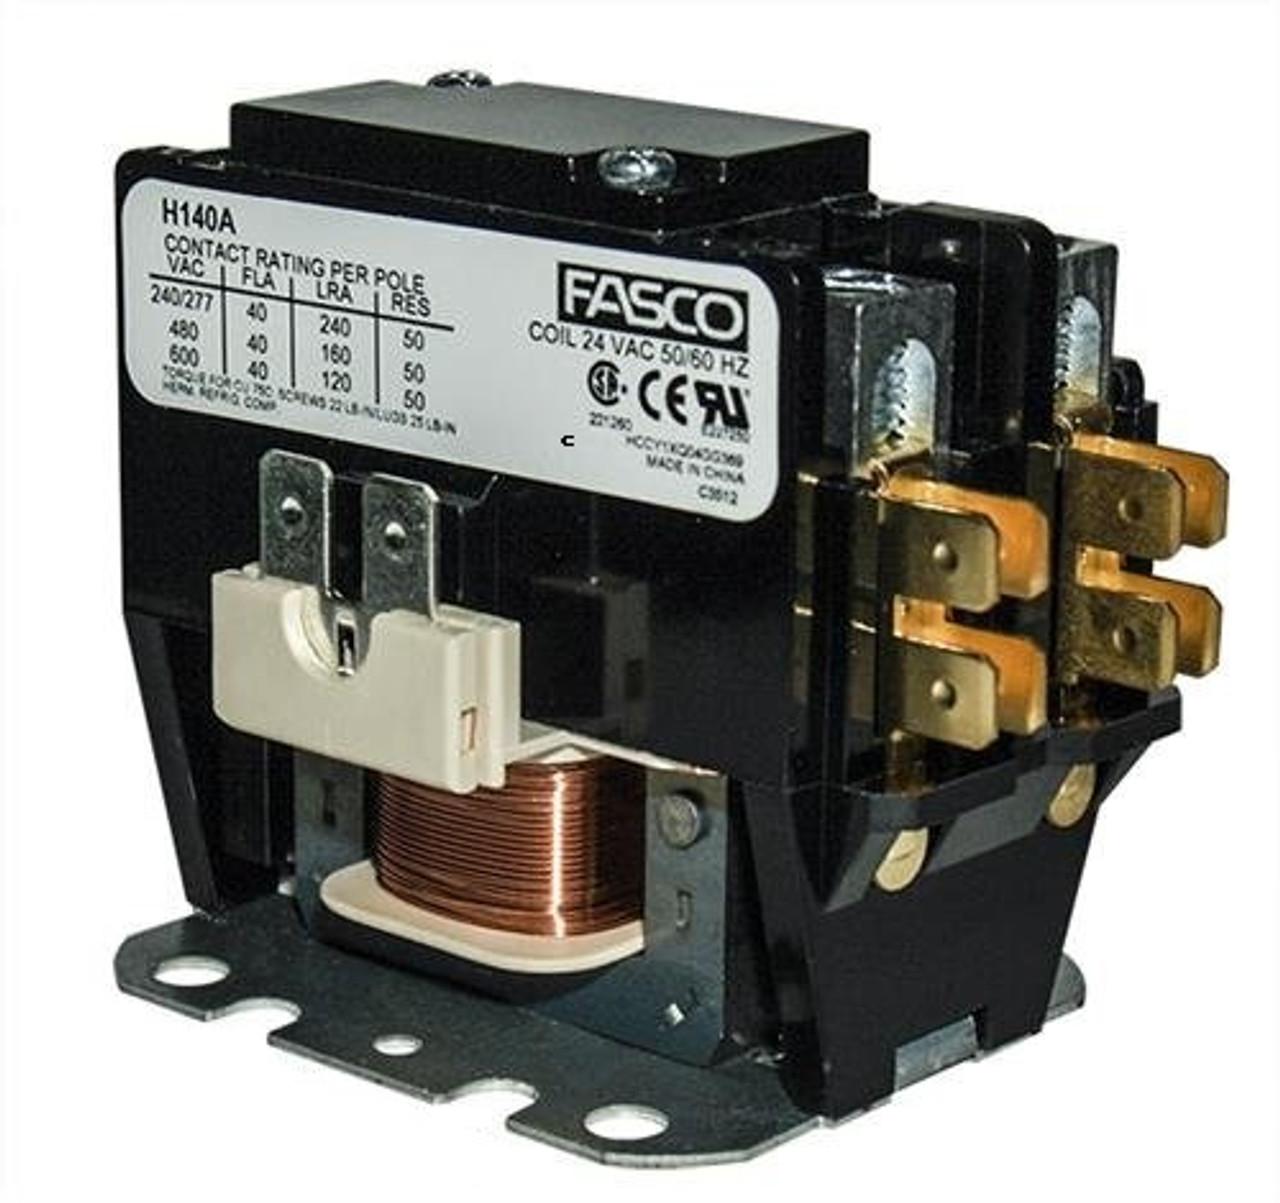 H140B, 1 pole, 40 amp, 120v coil Fasco Contactor